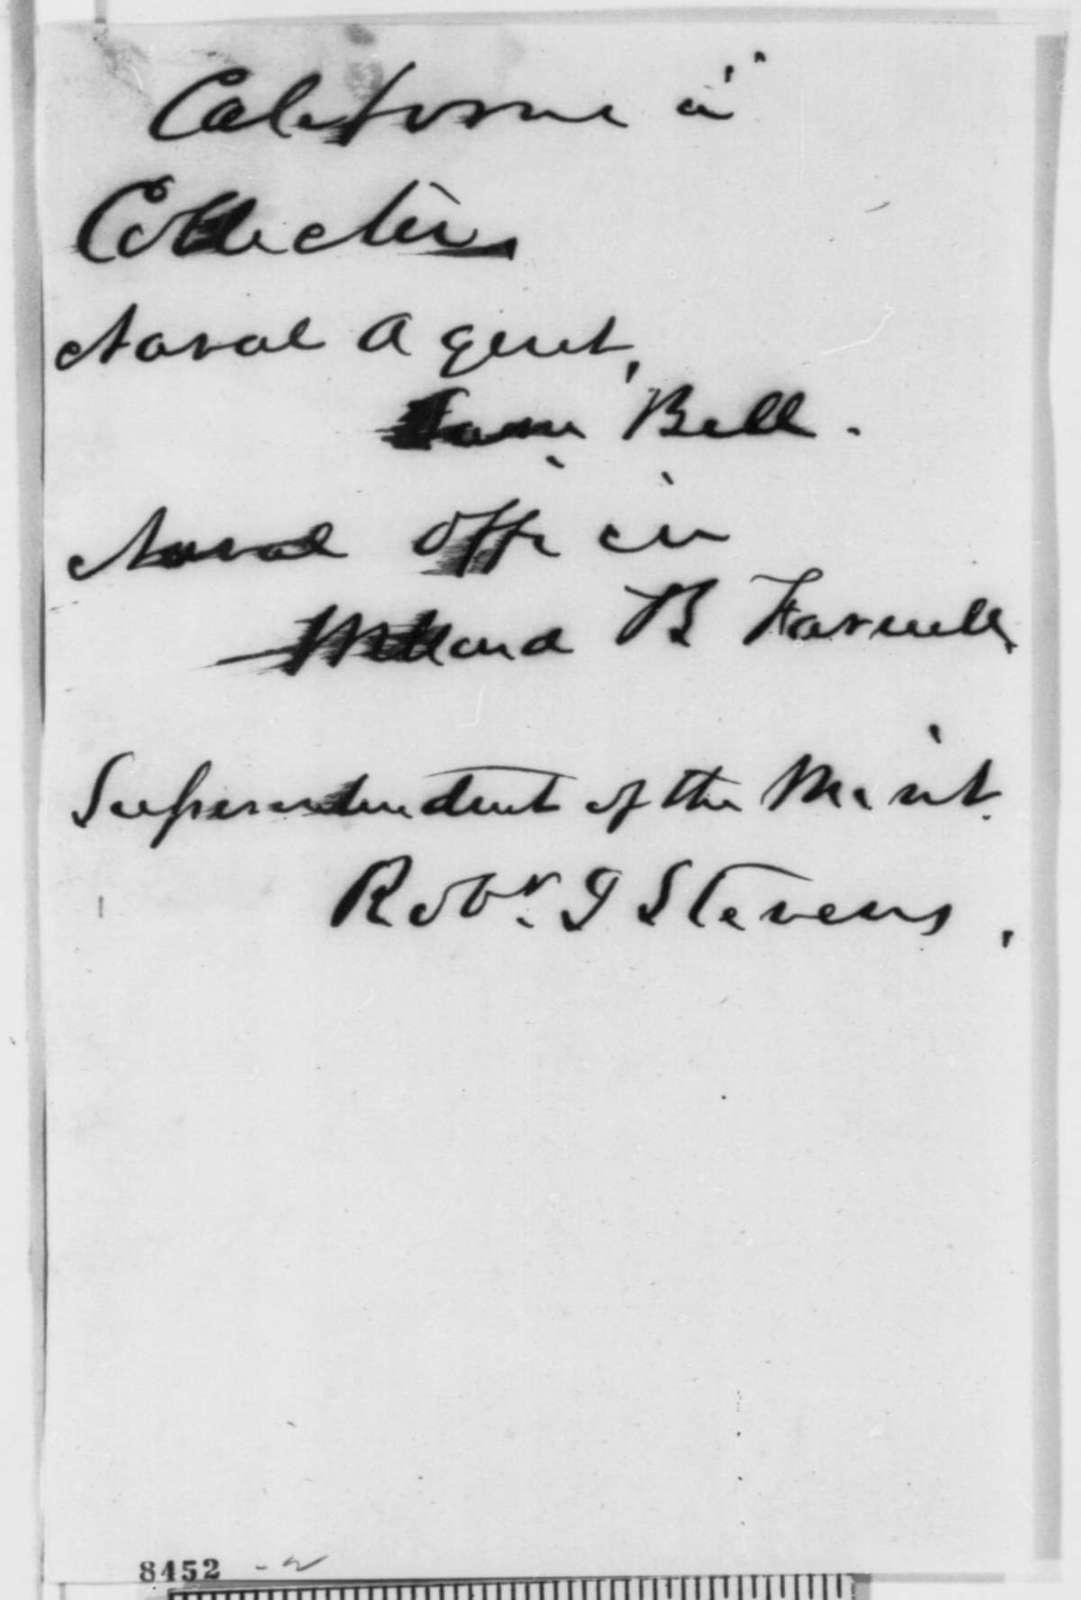 Abraham Lincoln, Friday, March 29, 1861  (Memorandum on Edward D. Baker's recommendations)